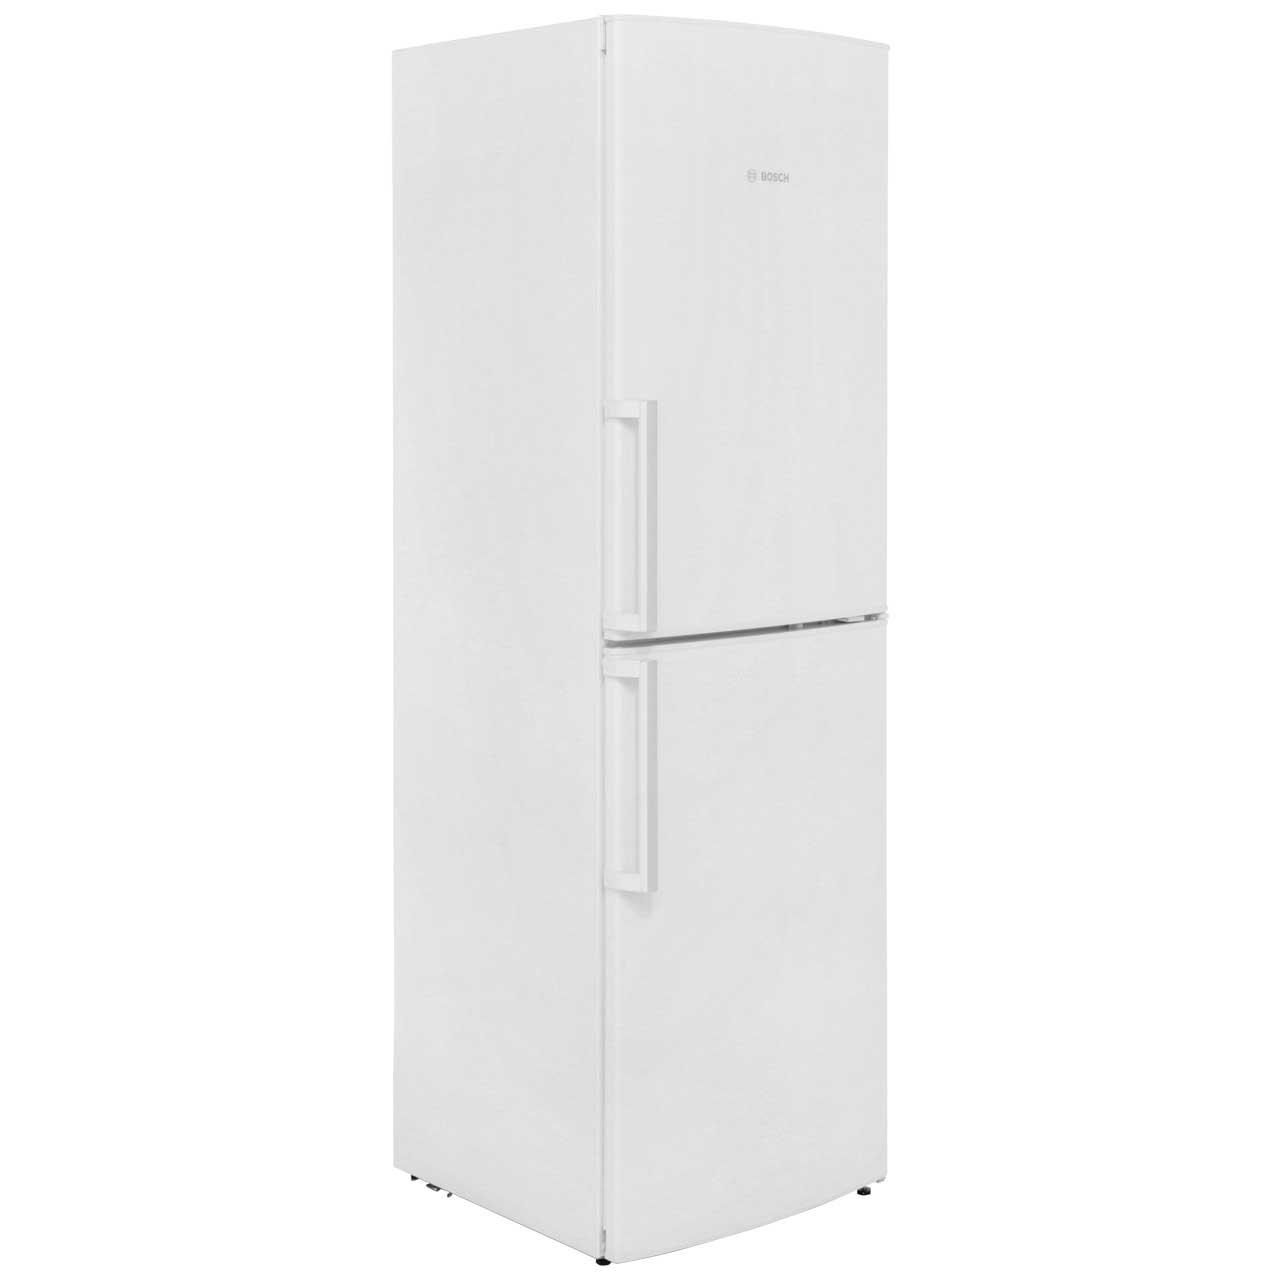 Image of Bosch Serie 4 KGN34VW20G Free Standing Fridge Freezer Frost Free in White